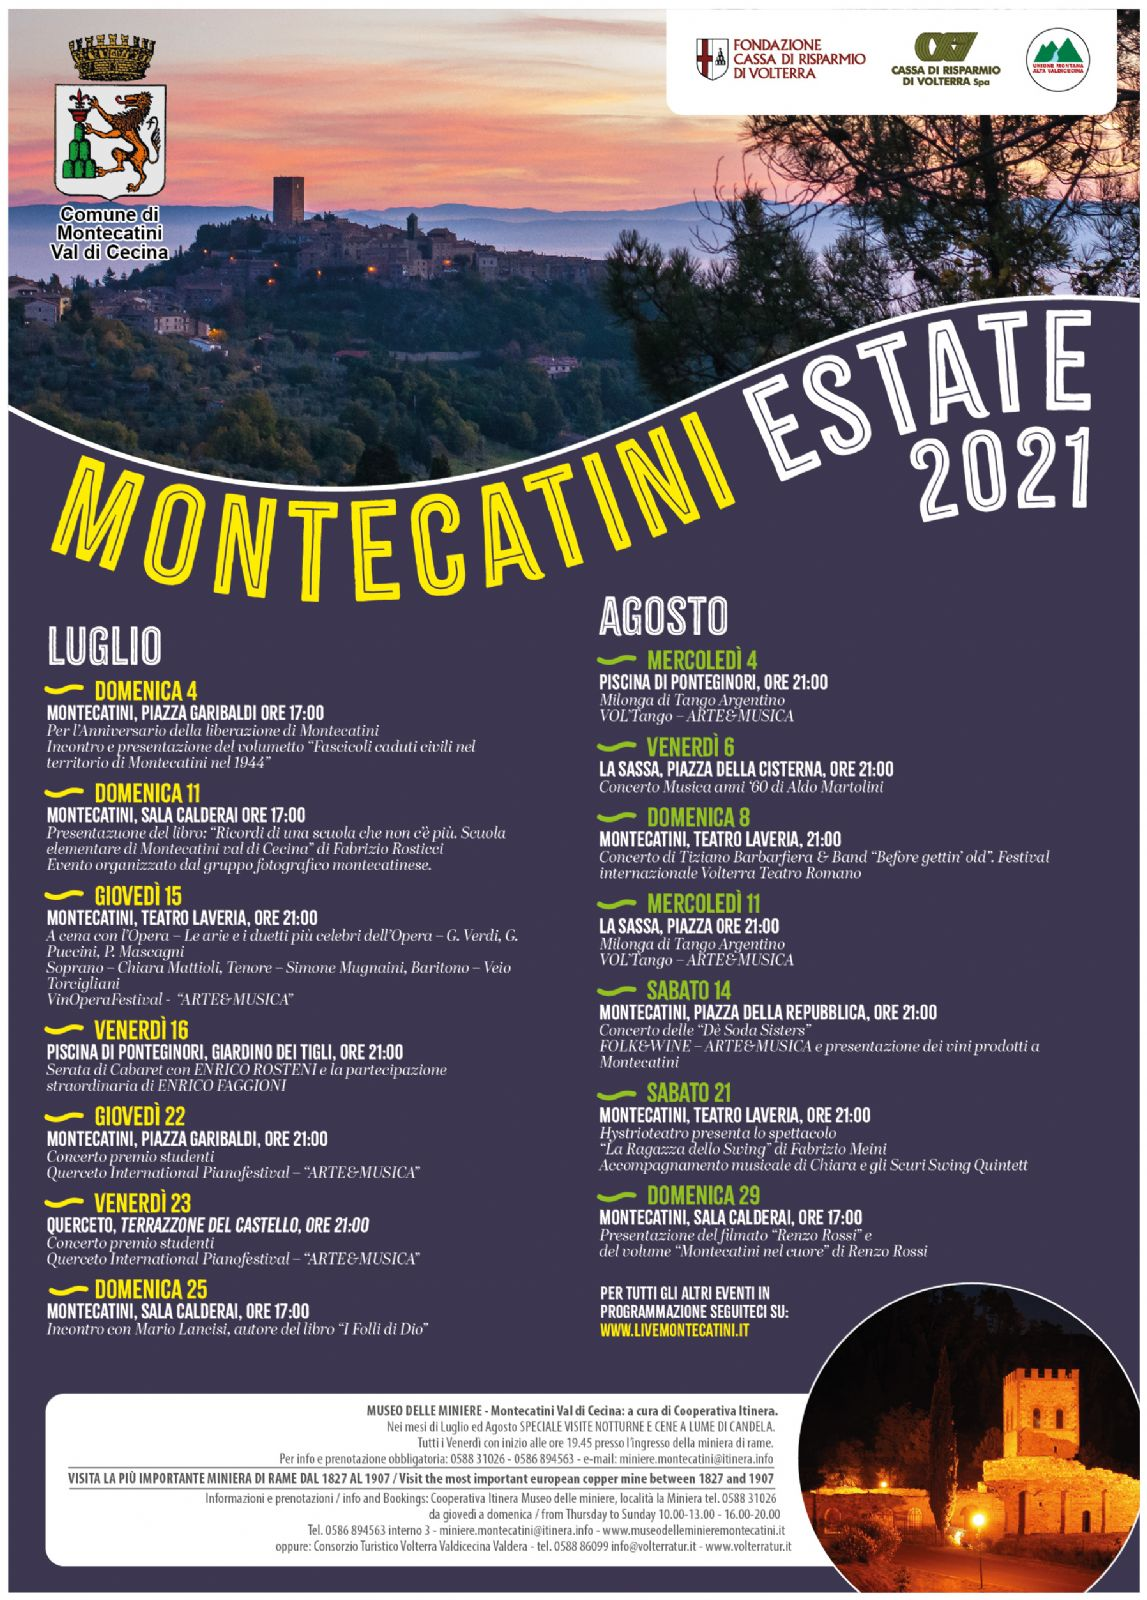 Summer in Montecatini Val di Cecina